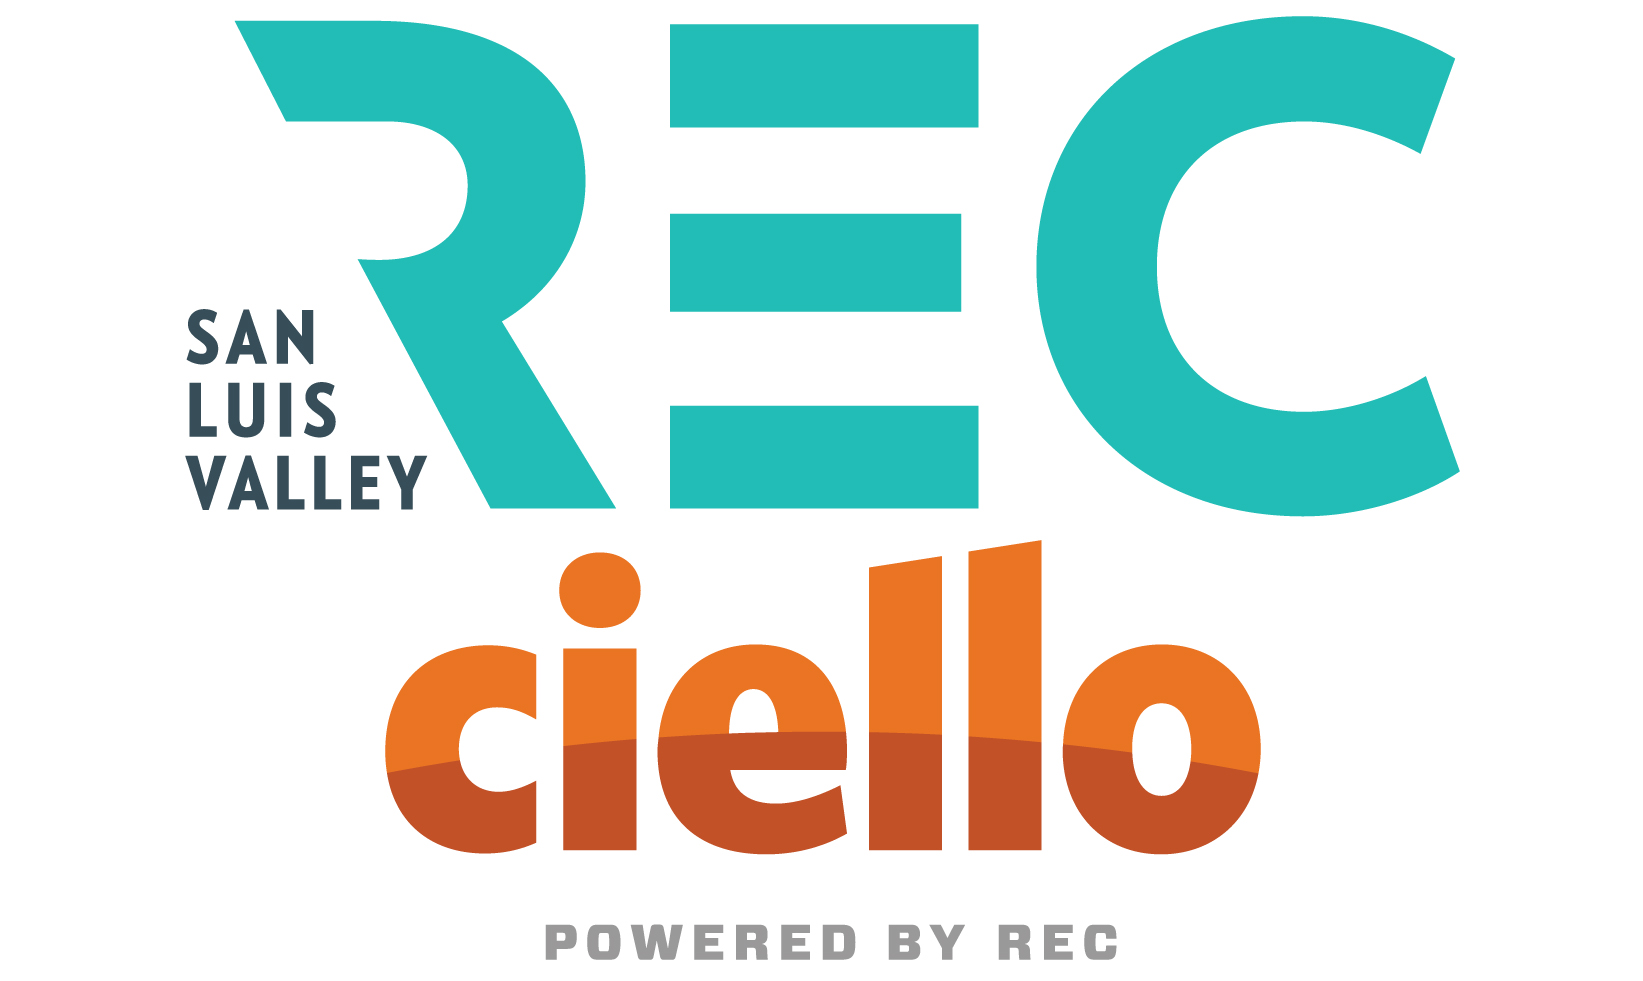 SLVrec-Ciello.jpg